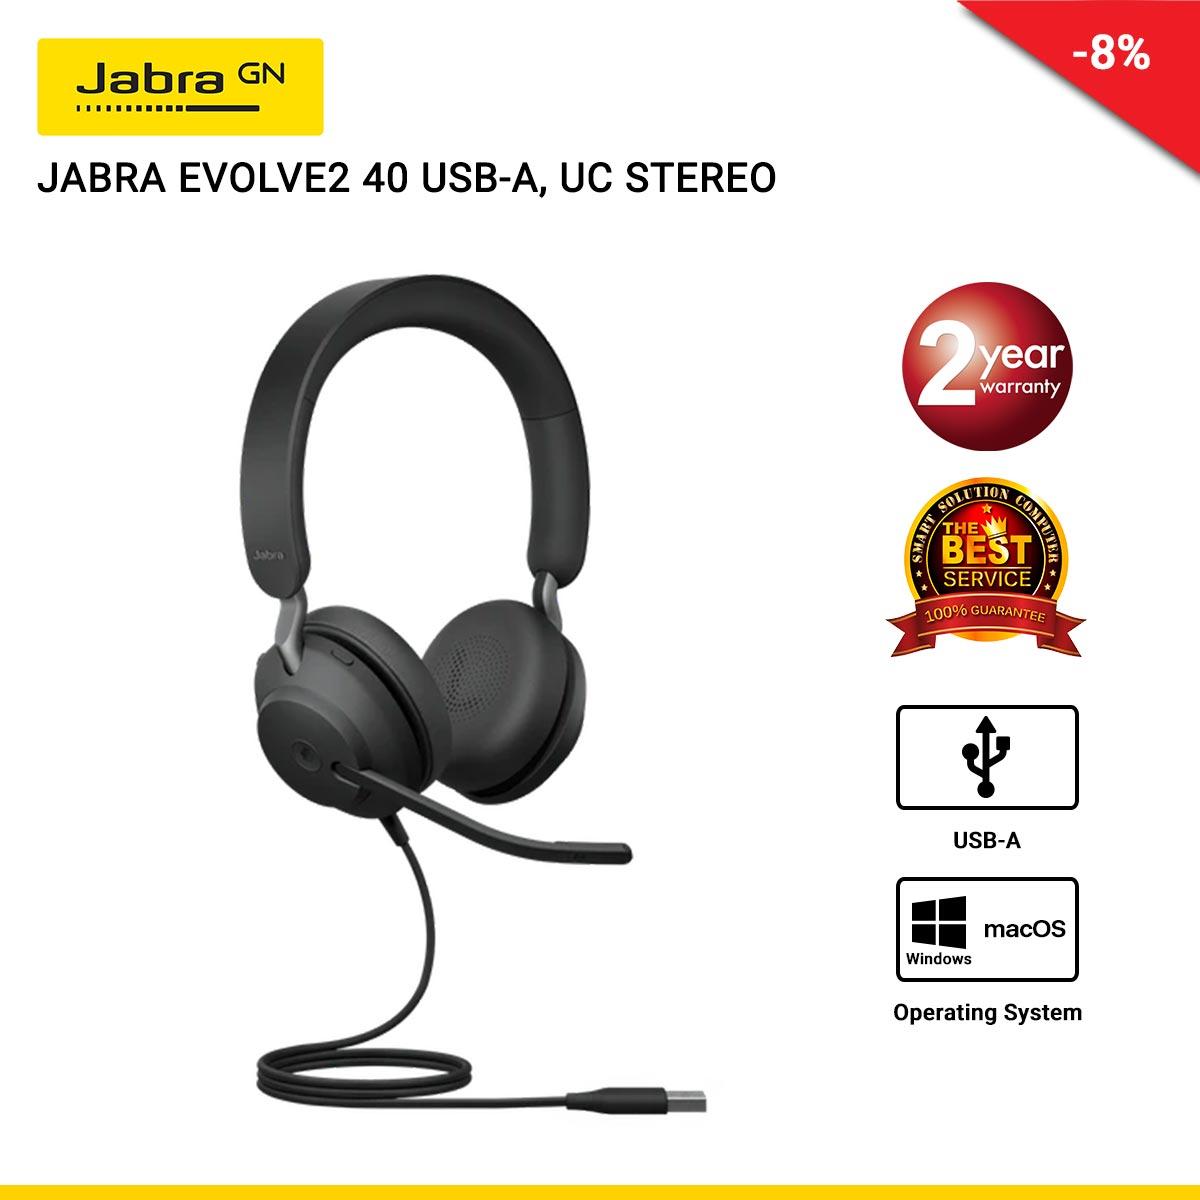 JABRA EVOLVE2 40 USB-A, UC STEREO (JBA-24089-989-999)